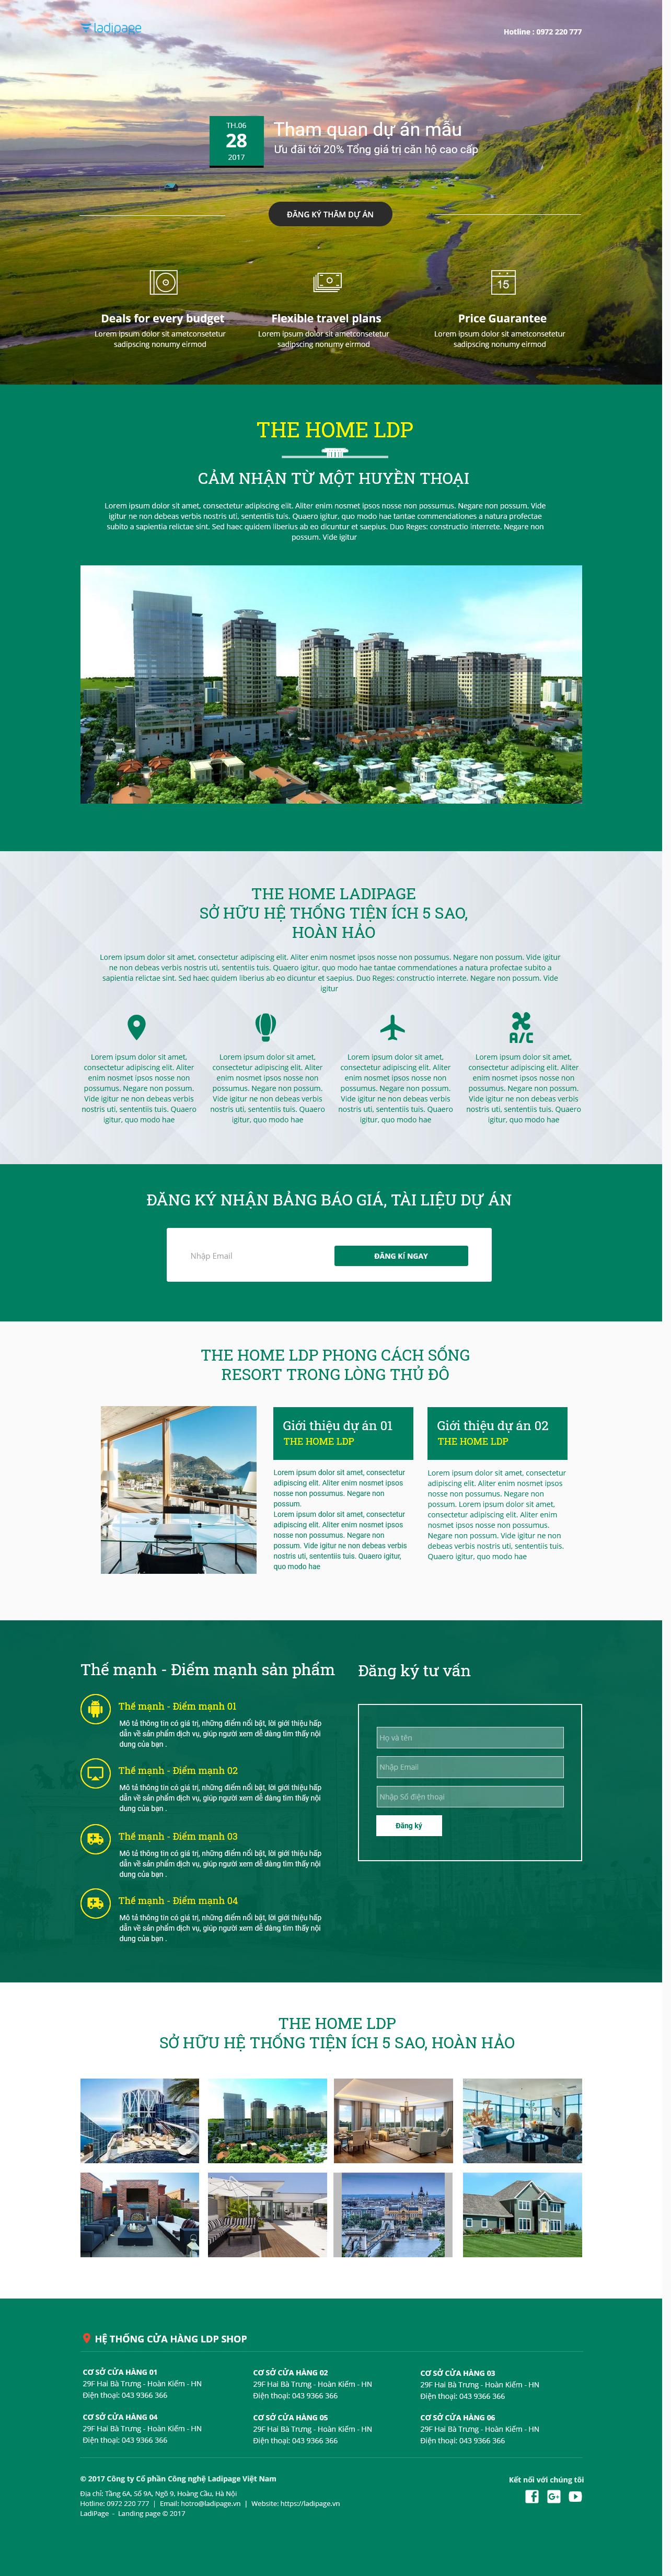 Thiết kế website Thiết kế webiste landingpage bat-dong-san Bất động sản 23